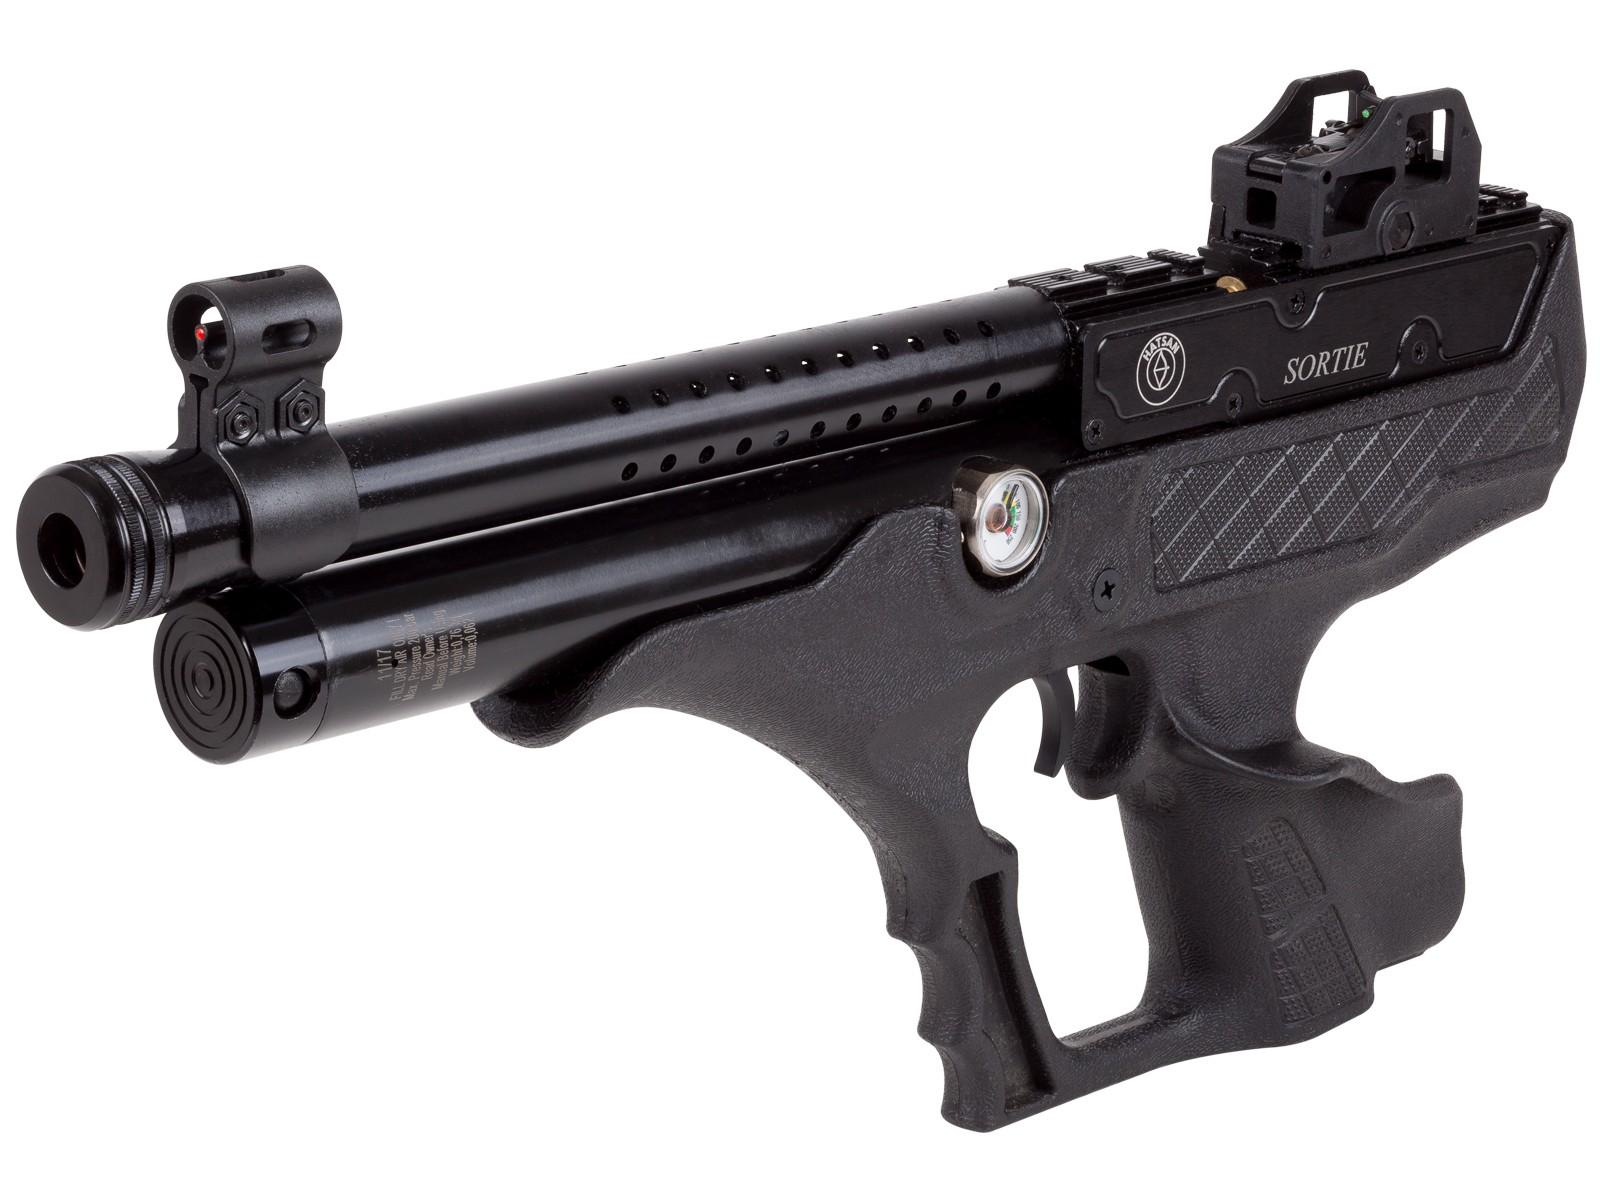 Hatsan Sortie Semi-Auto PCP Air Pistol, Synthetic 0.177 Image